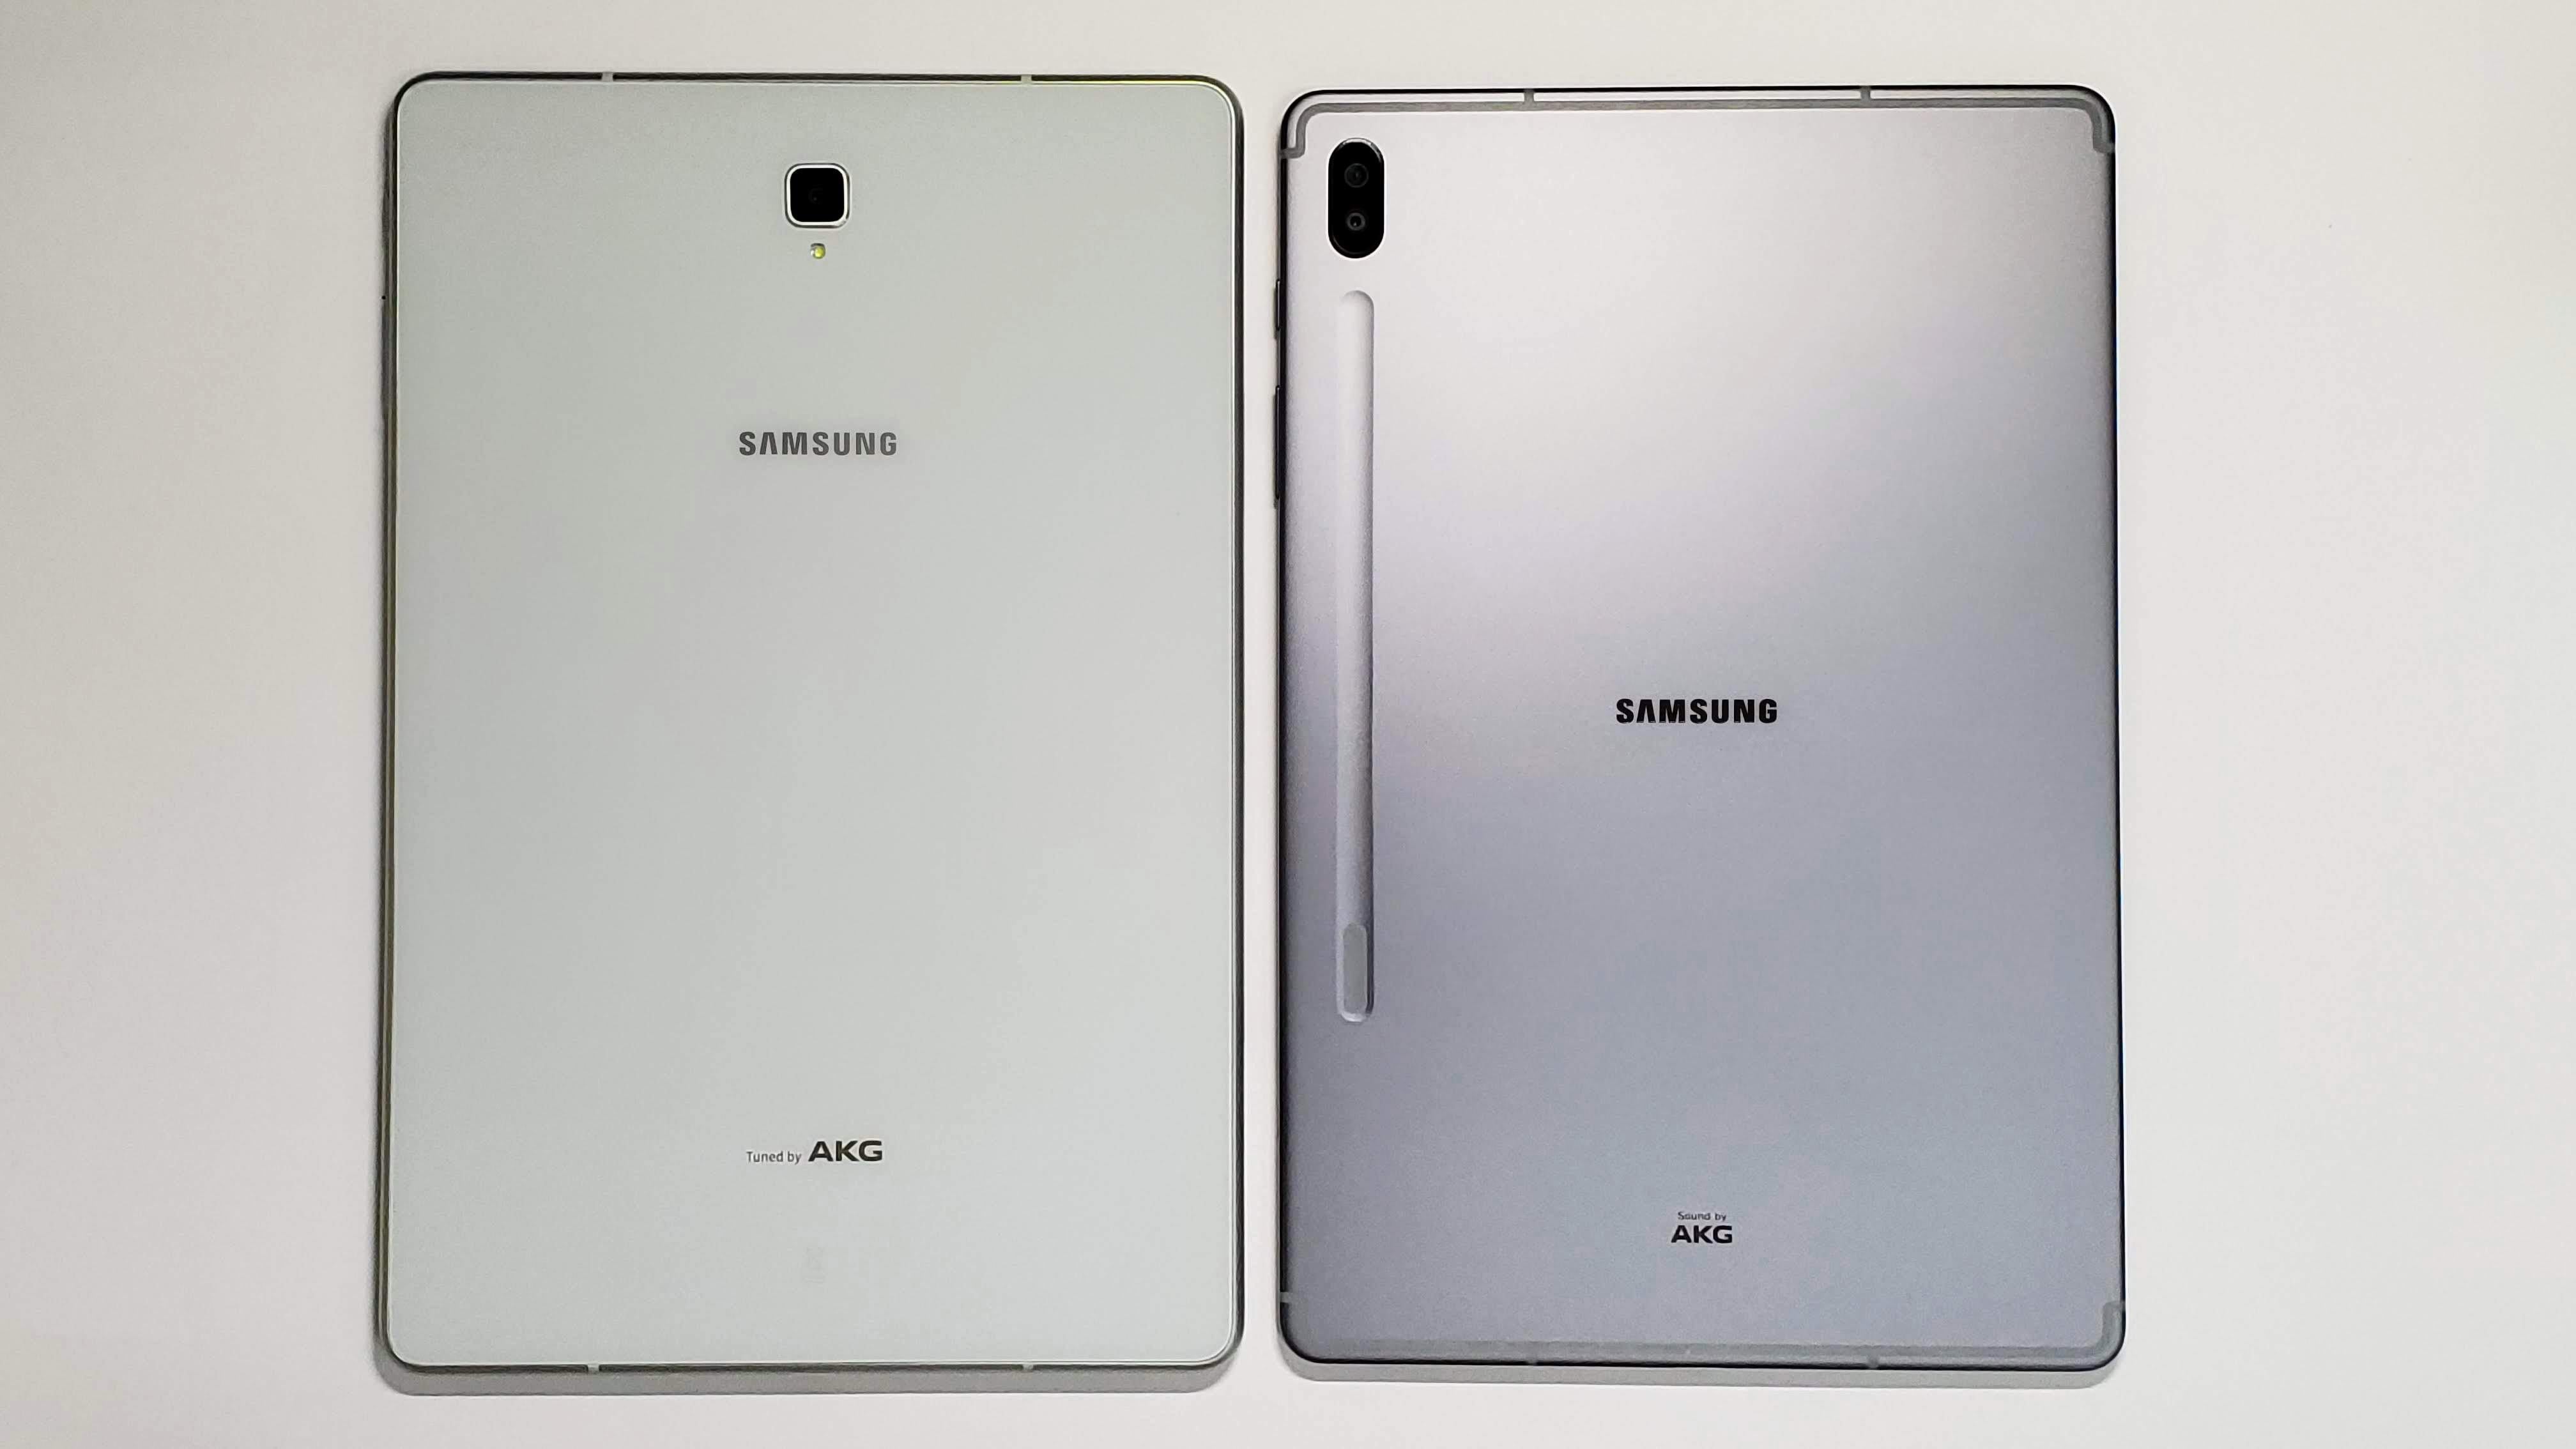 Samsung Galaxy Tab S6-前モデル Galaxy Tab S4 / iPad Air 3 (2019) と比較